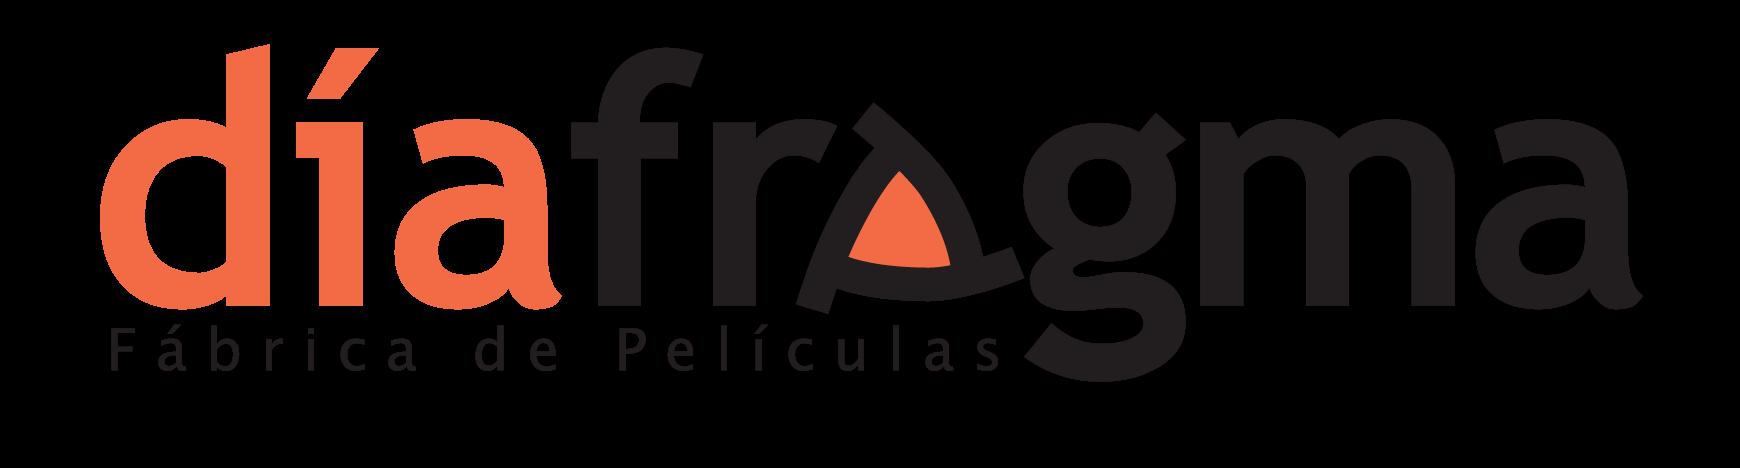 Díafragma - Fábrica de Películas